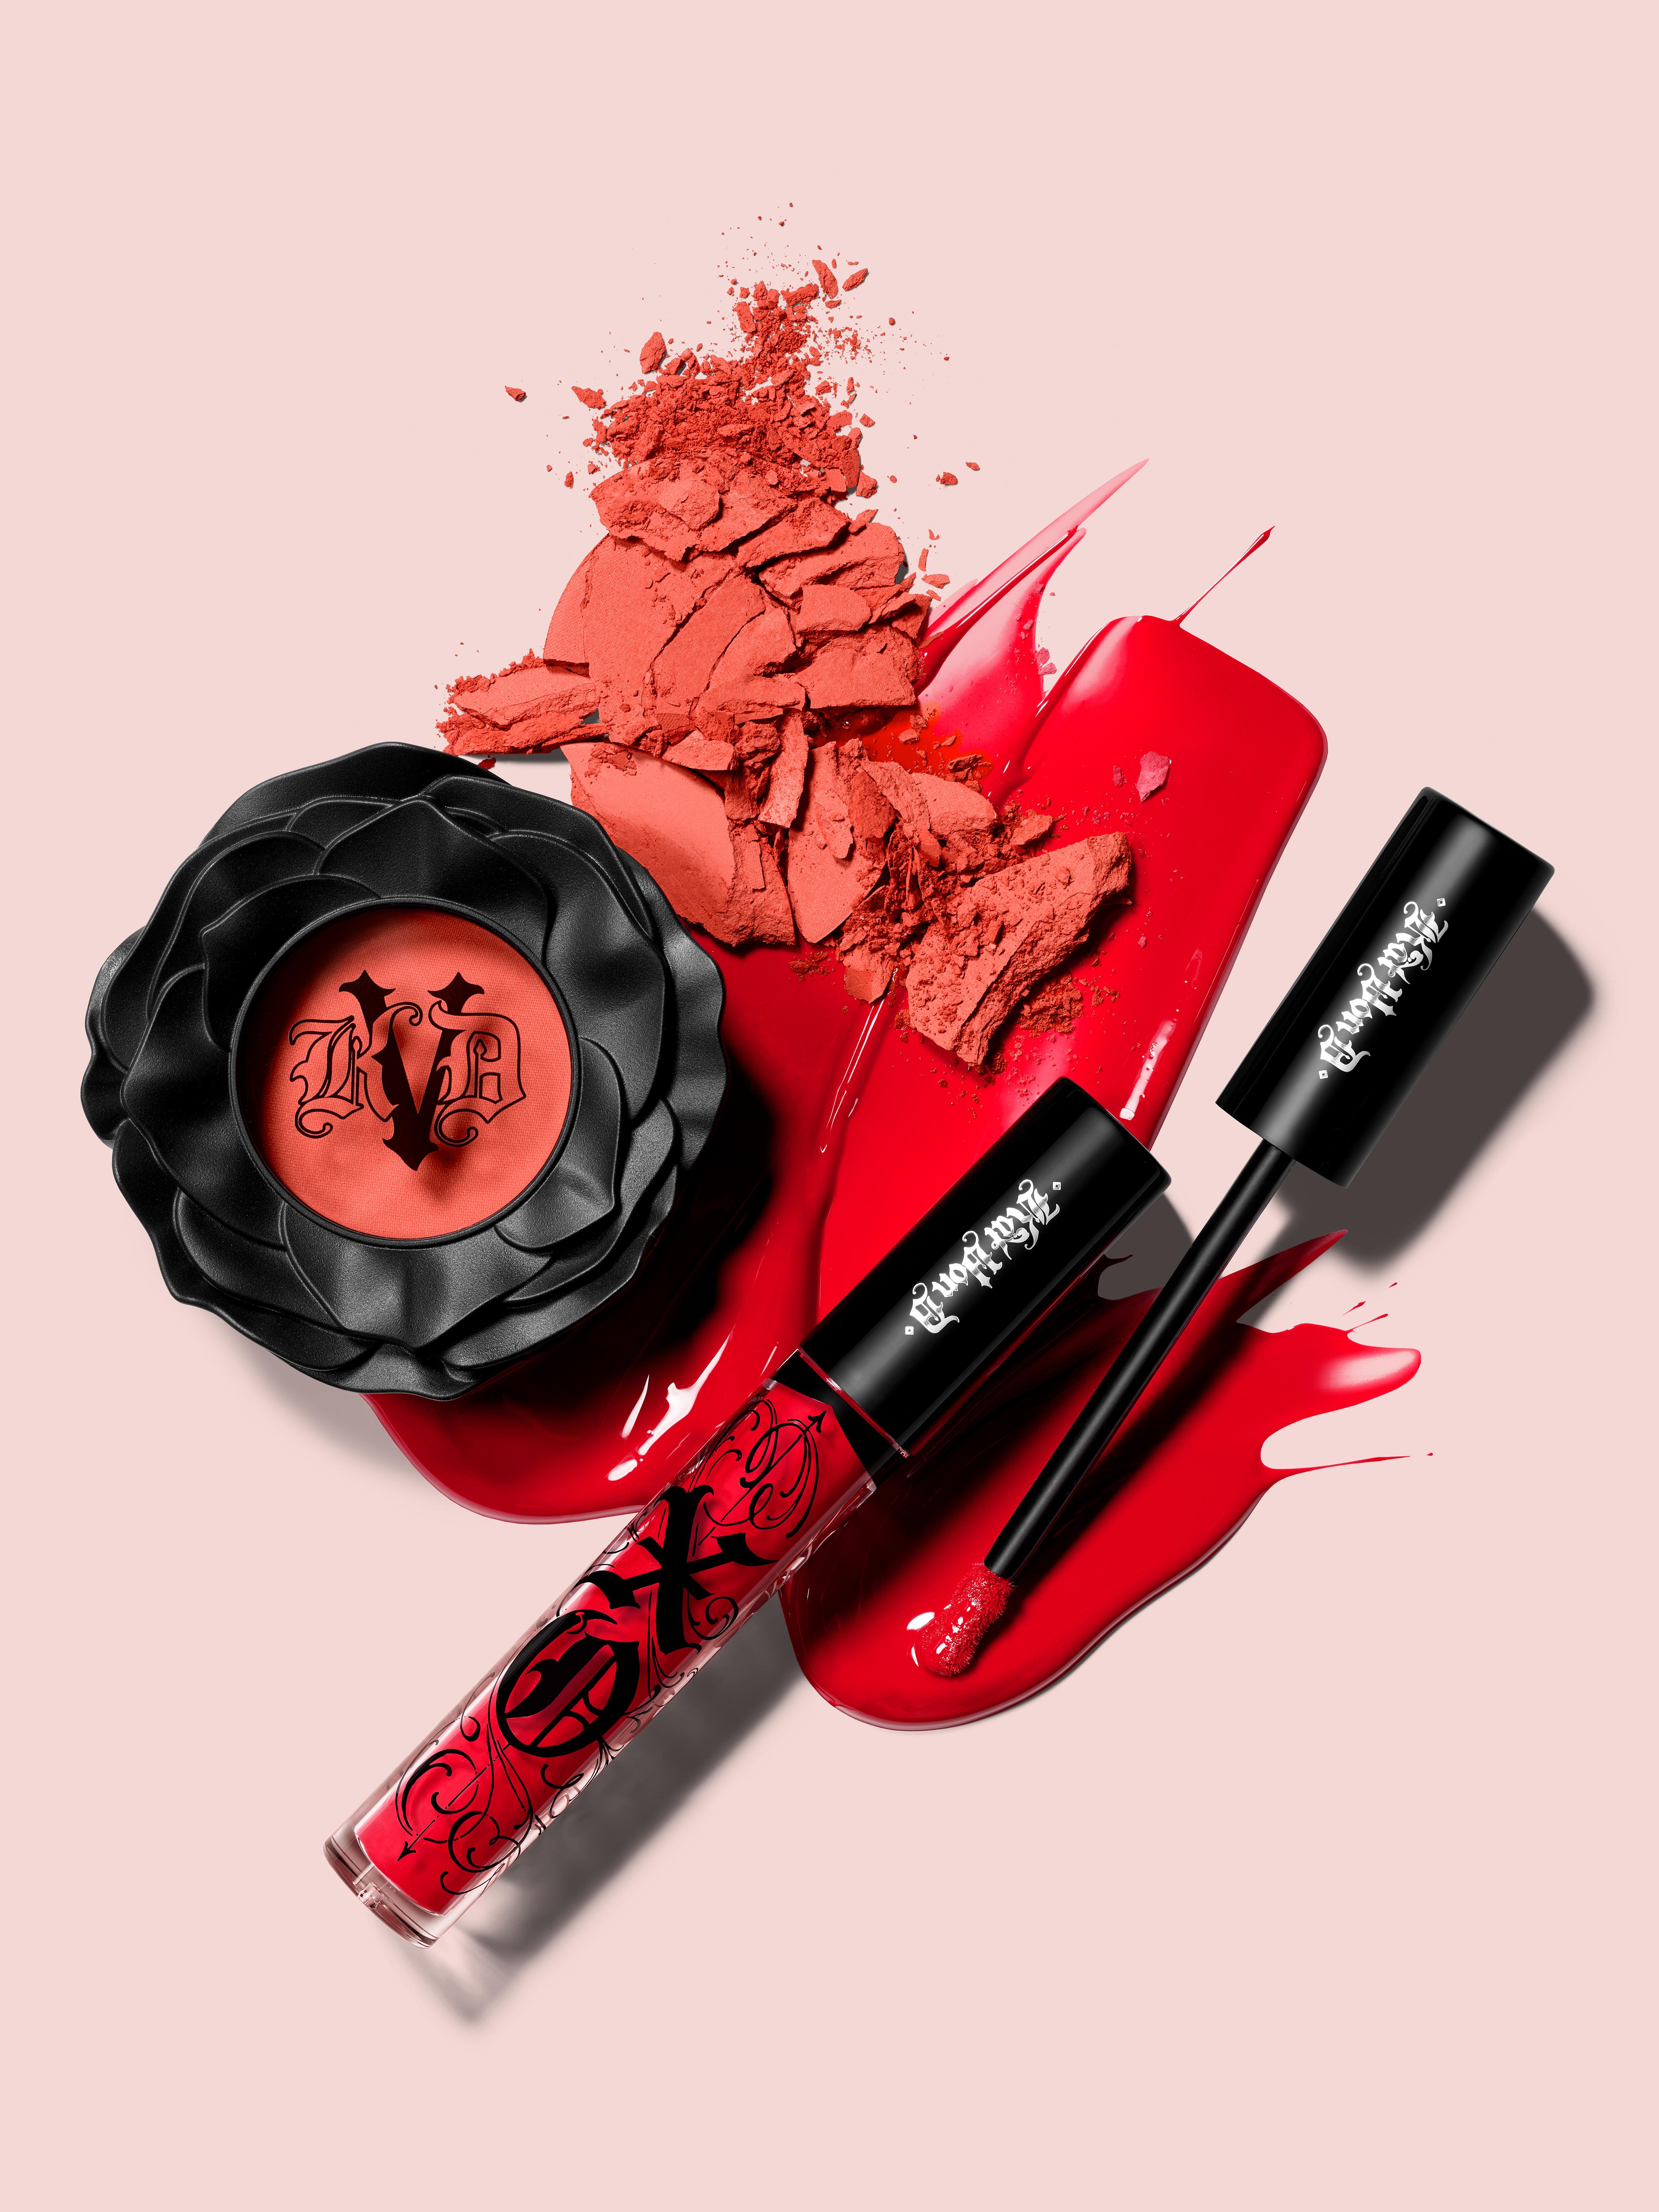 KVD Beauty Everlasting Blush, poppy